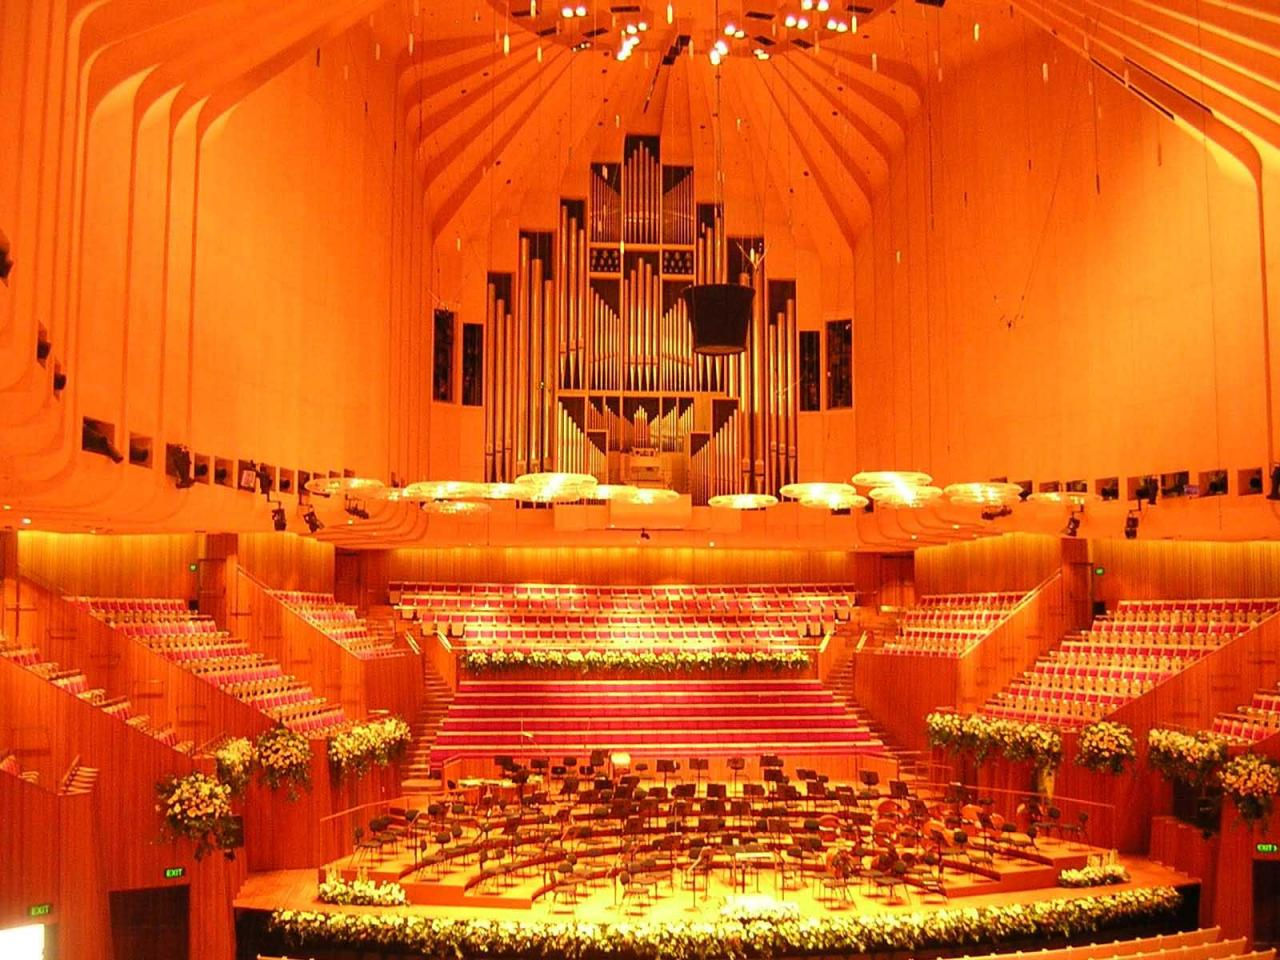 sydney-opera-house-interior-image